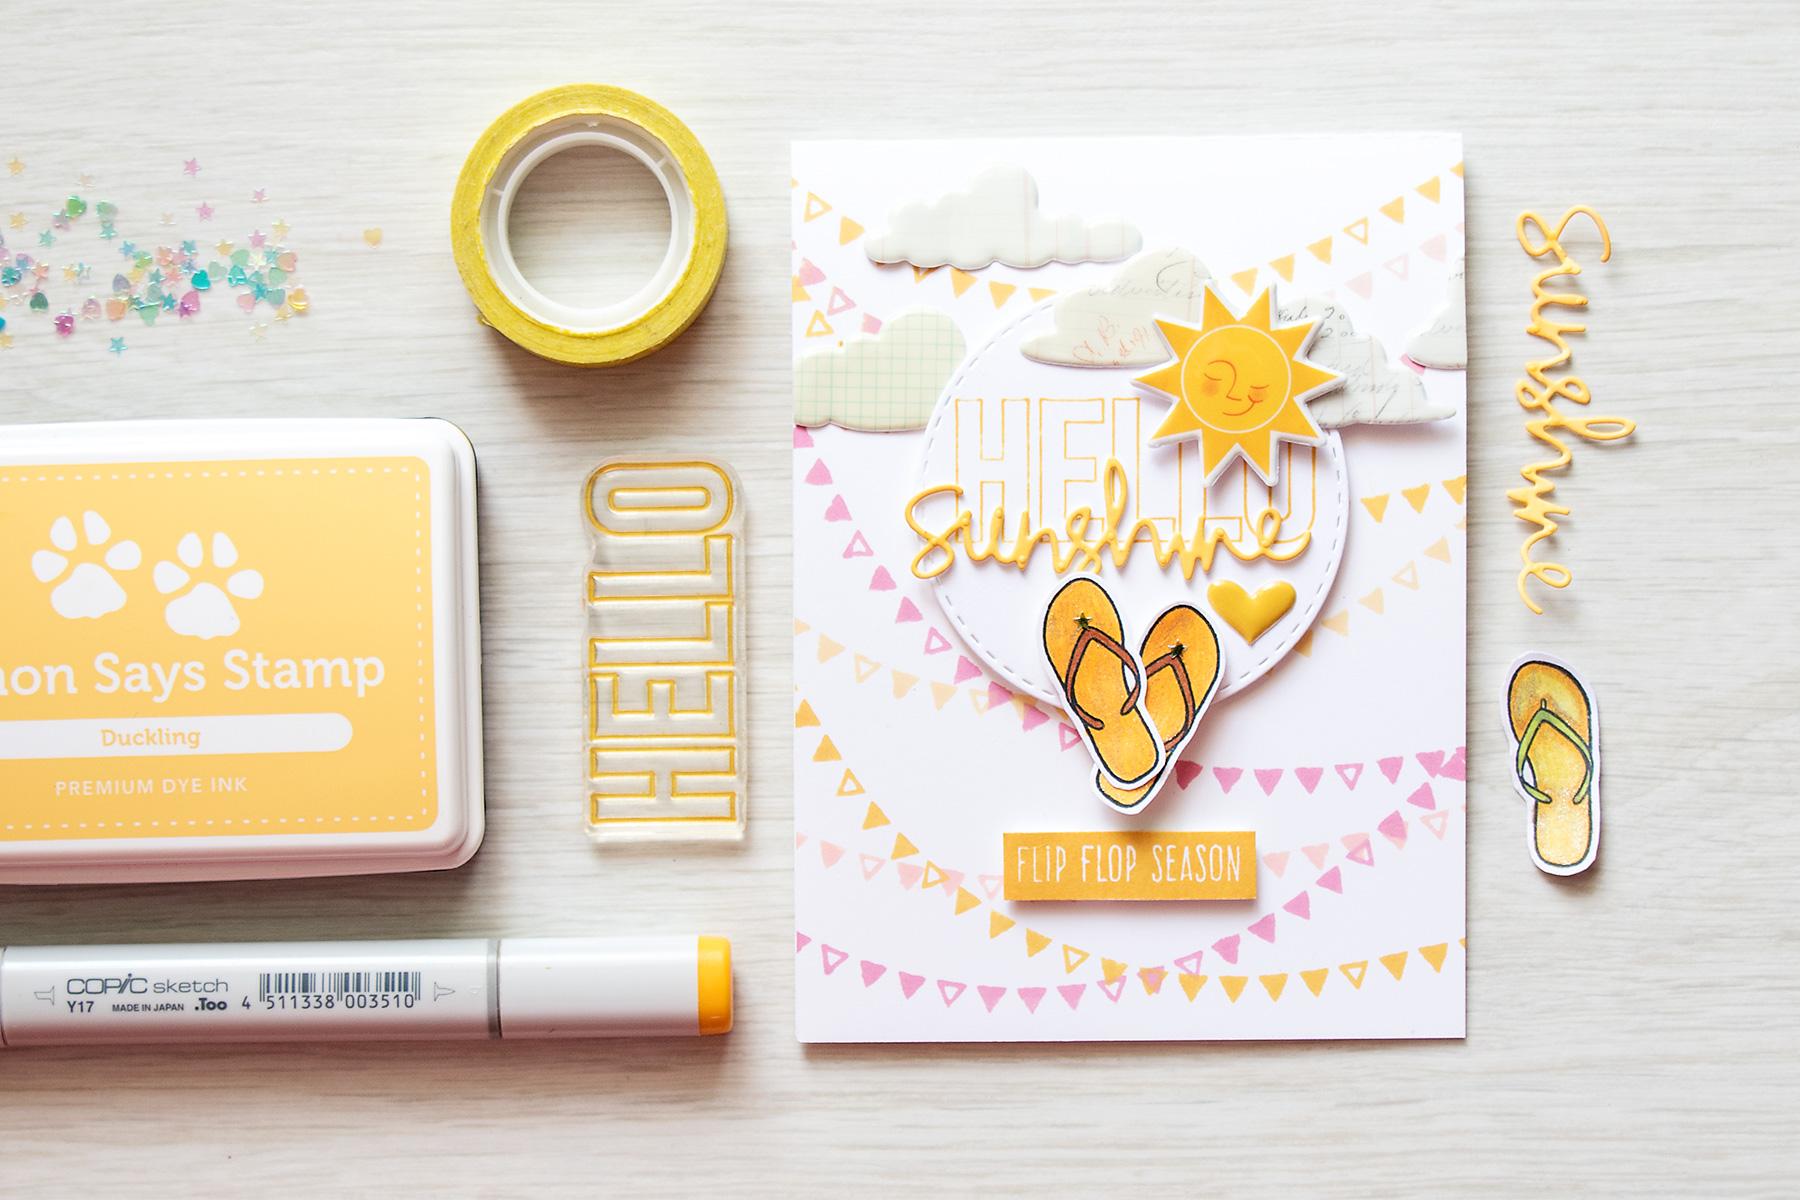 Simon Says Stamp August Card Kit - Hello Sunshine. Video